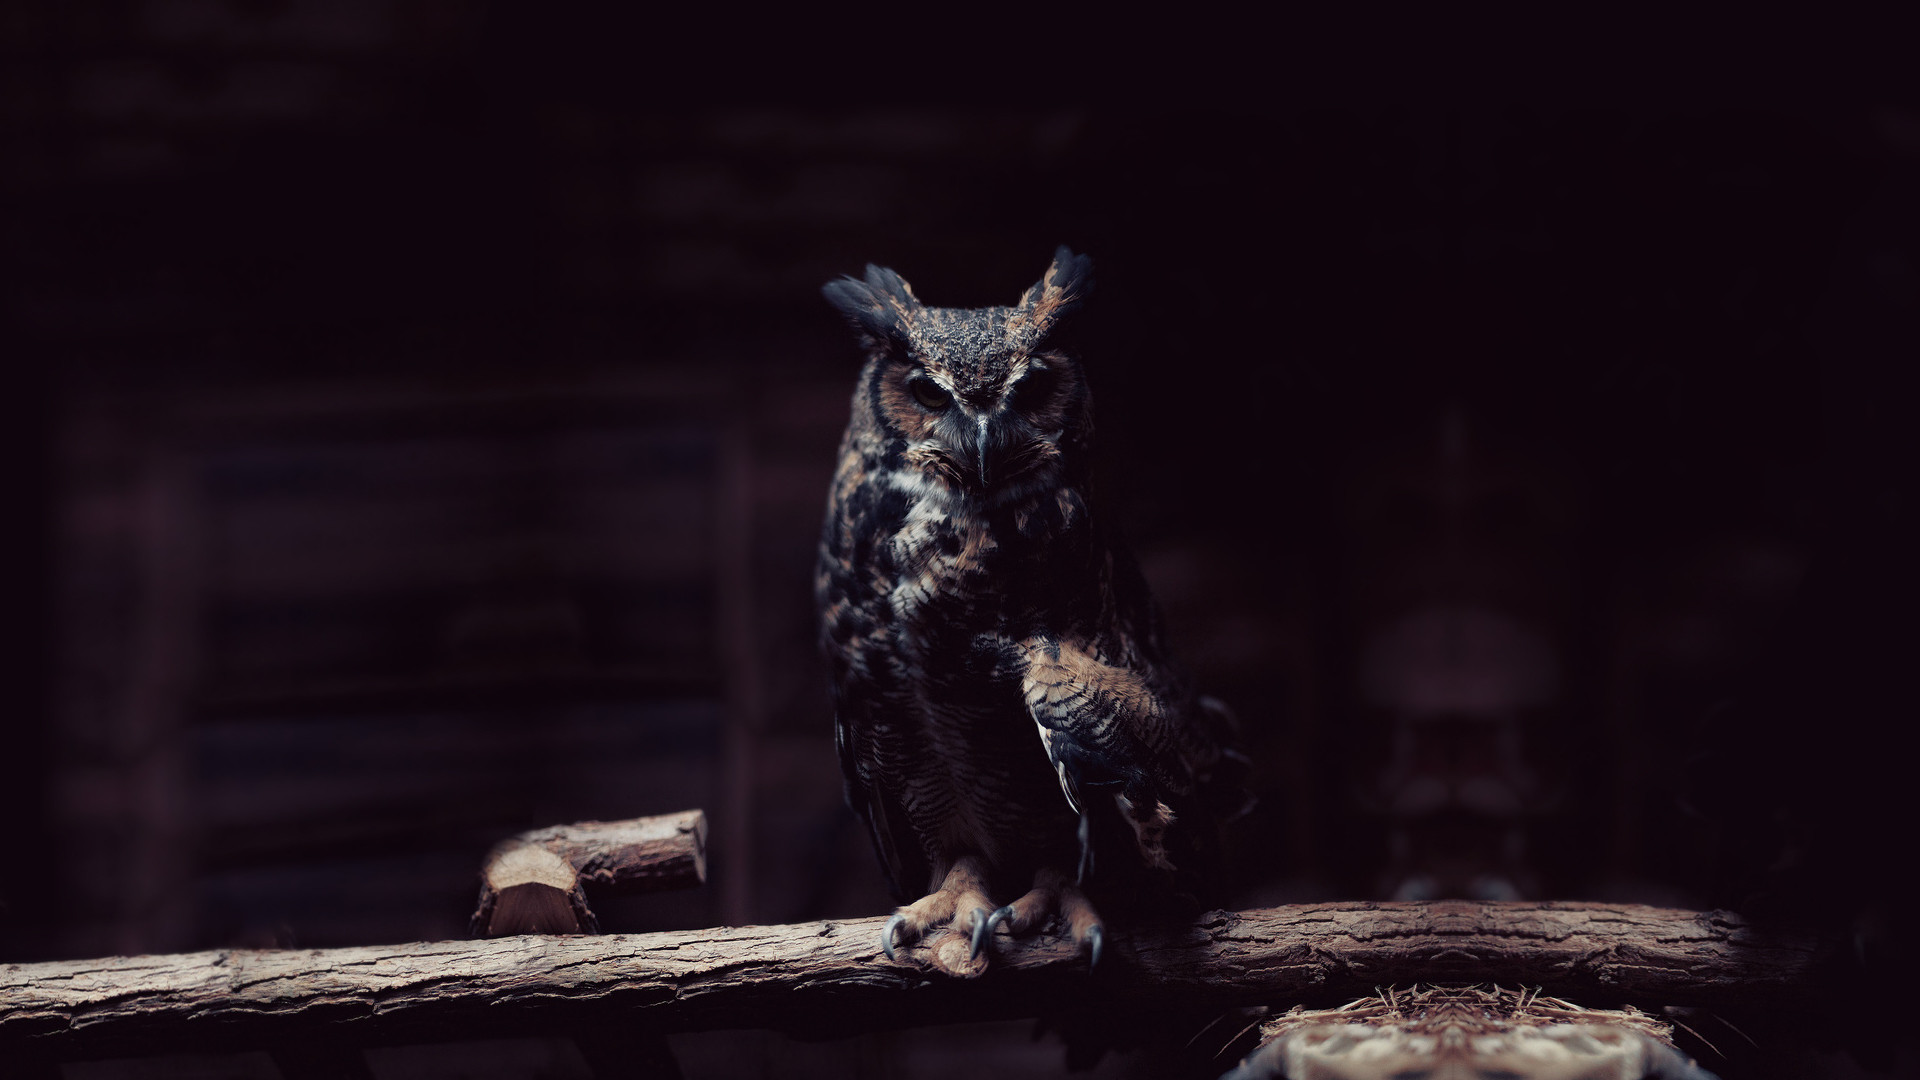 Amazing Black Owl Wallpapers